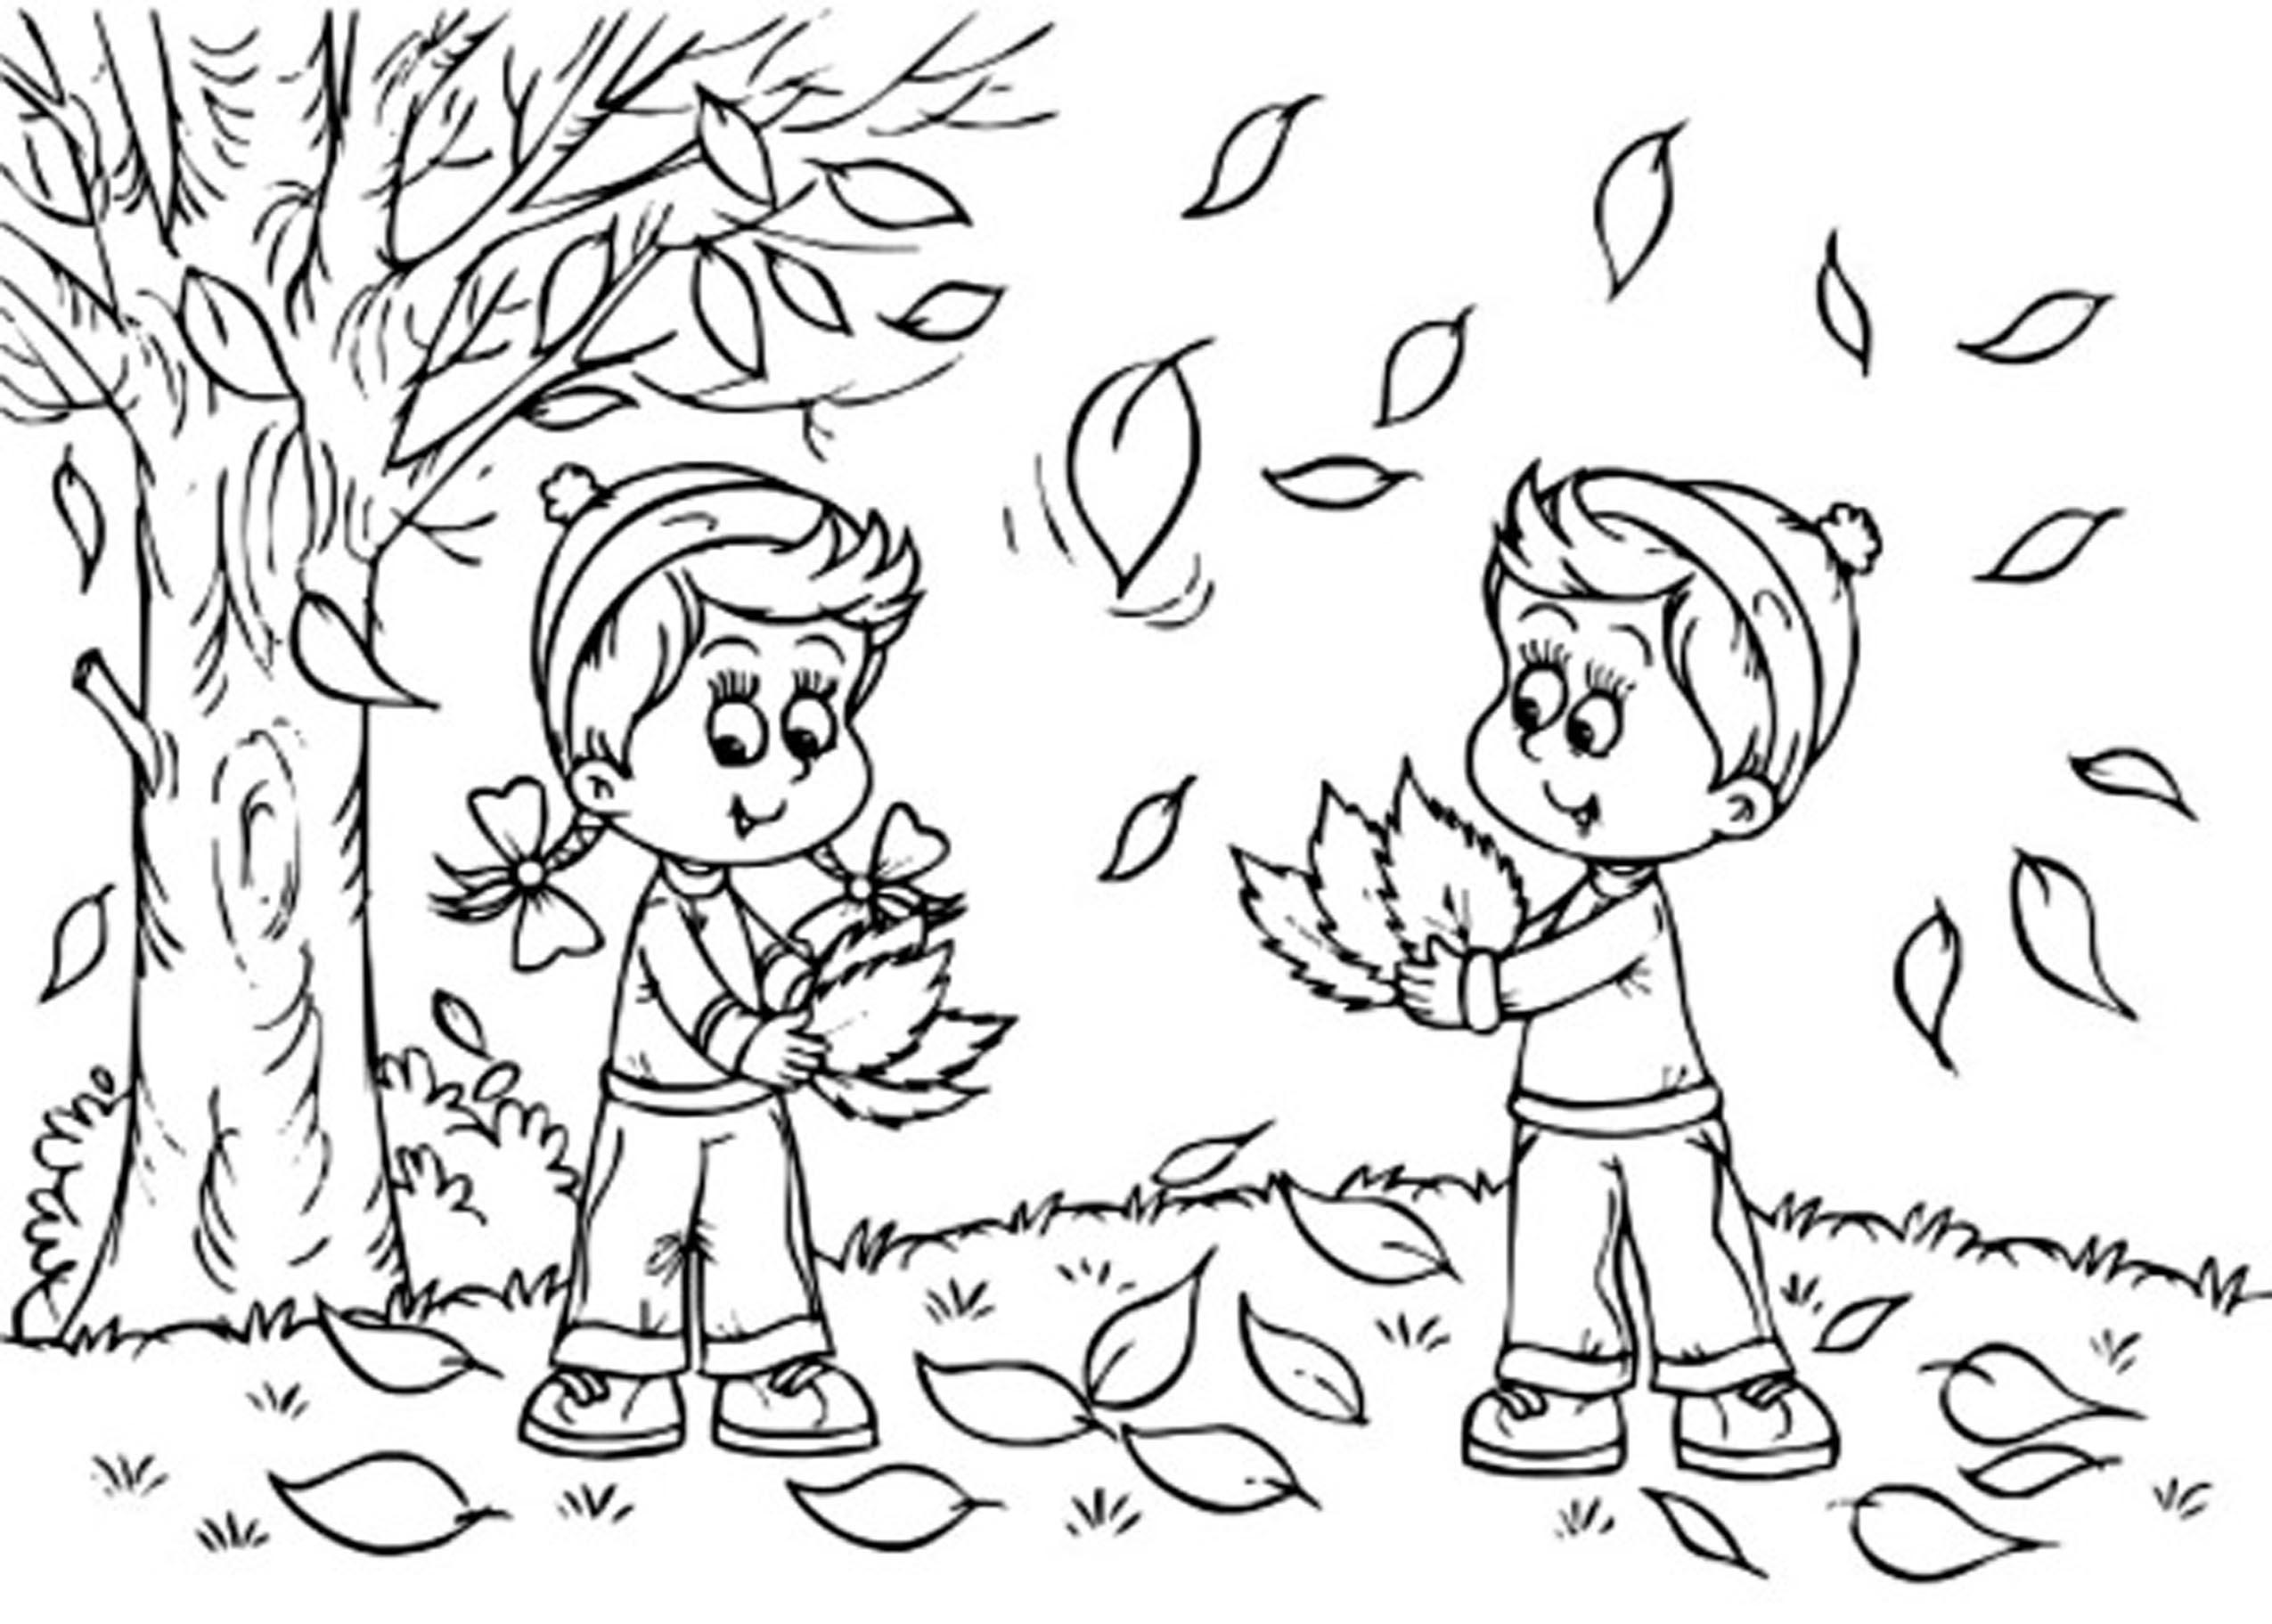 autumn season coloring pages autumn season with fall leaf coloring page color luna season pages coloring autumn